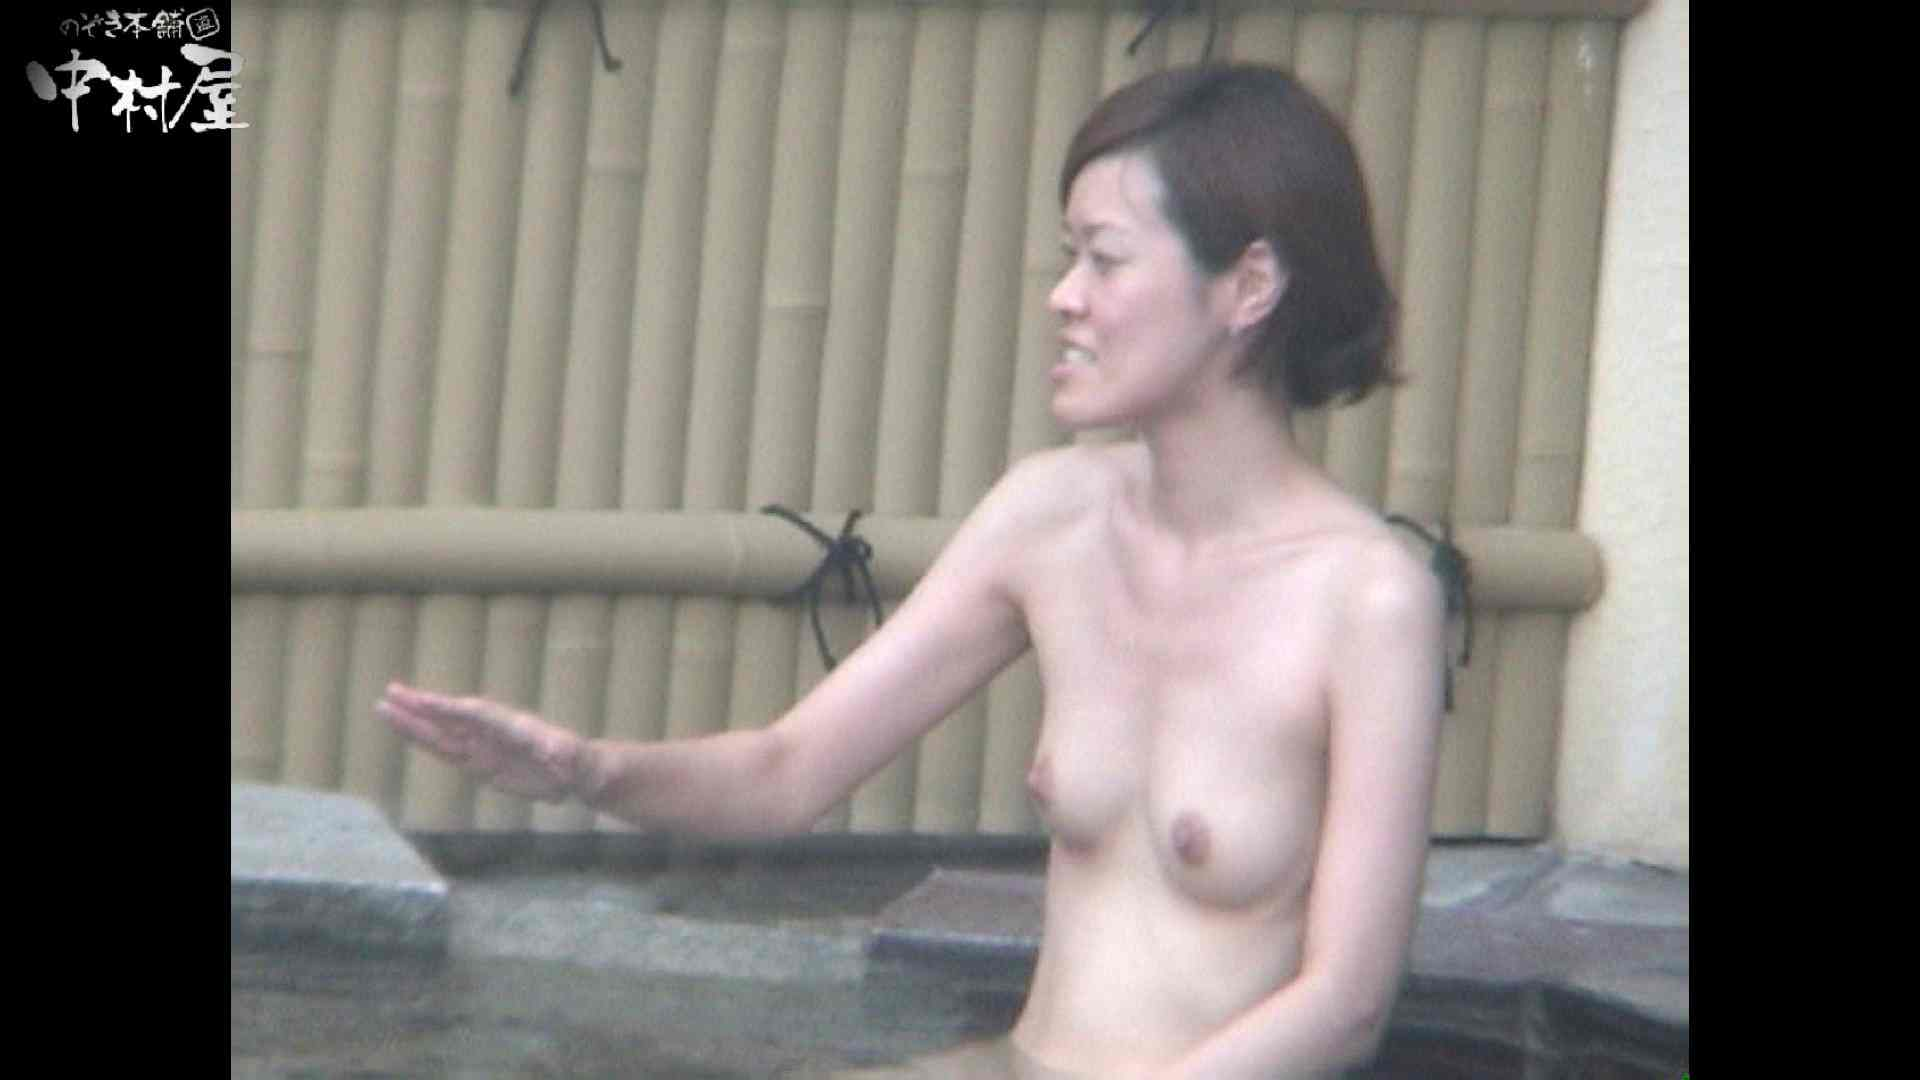 Aquaな露天風呂Vol.961 OL女体  65連発 36